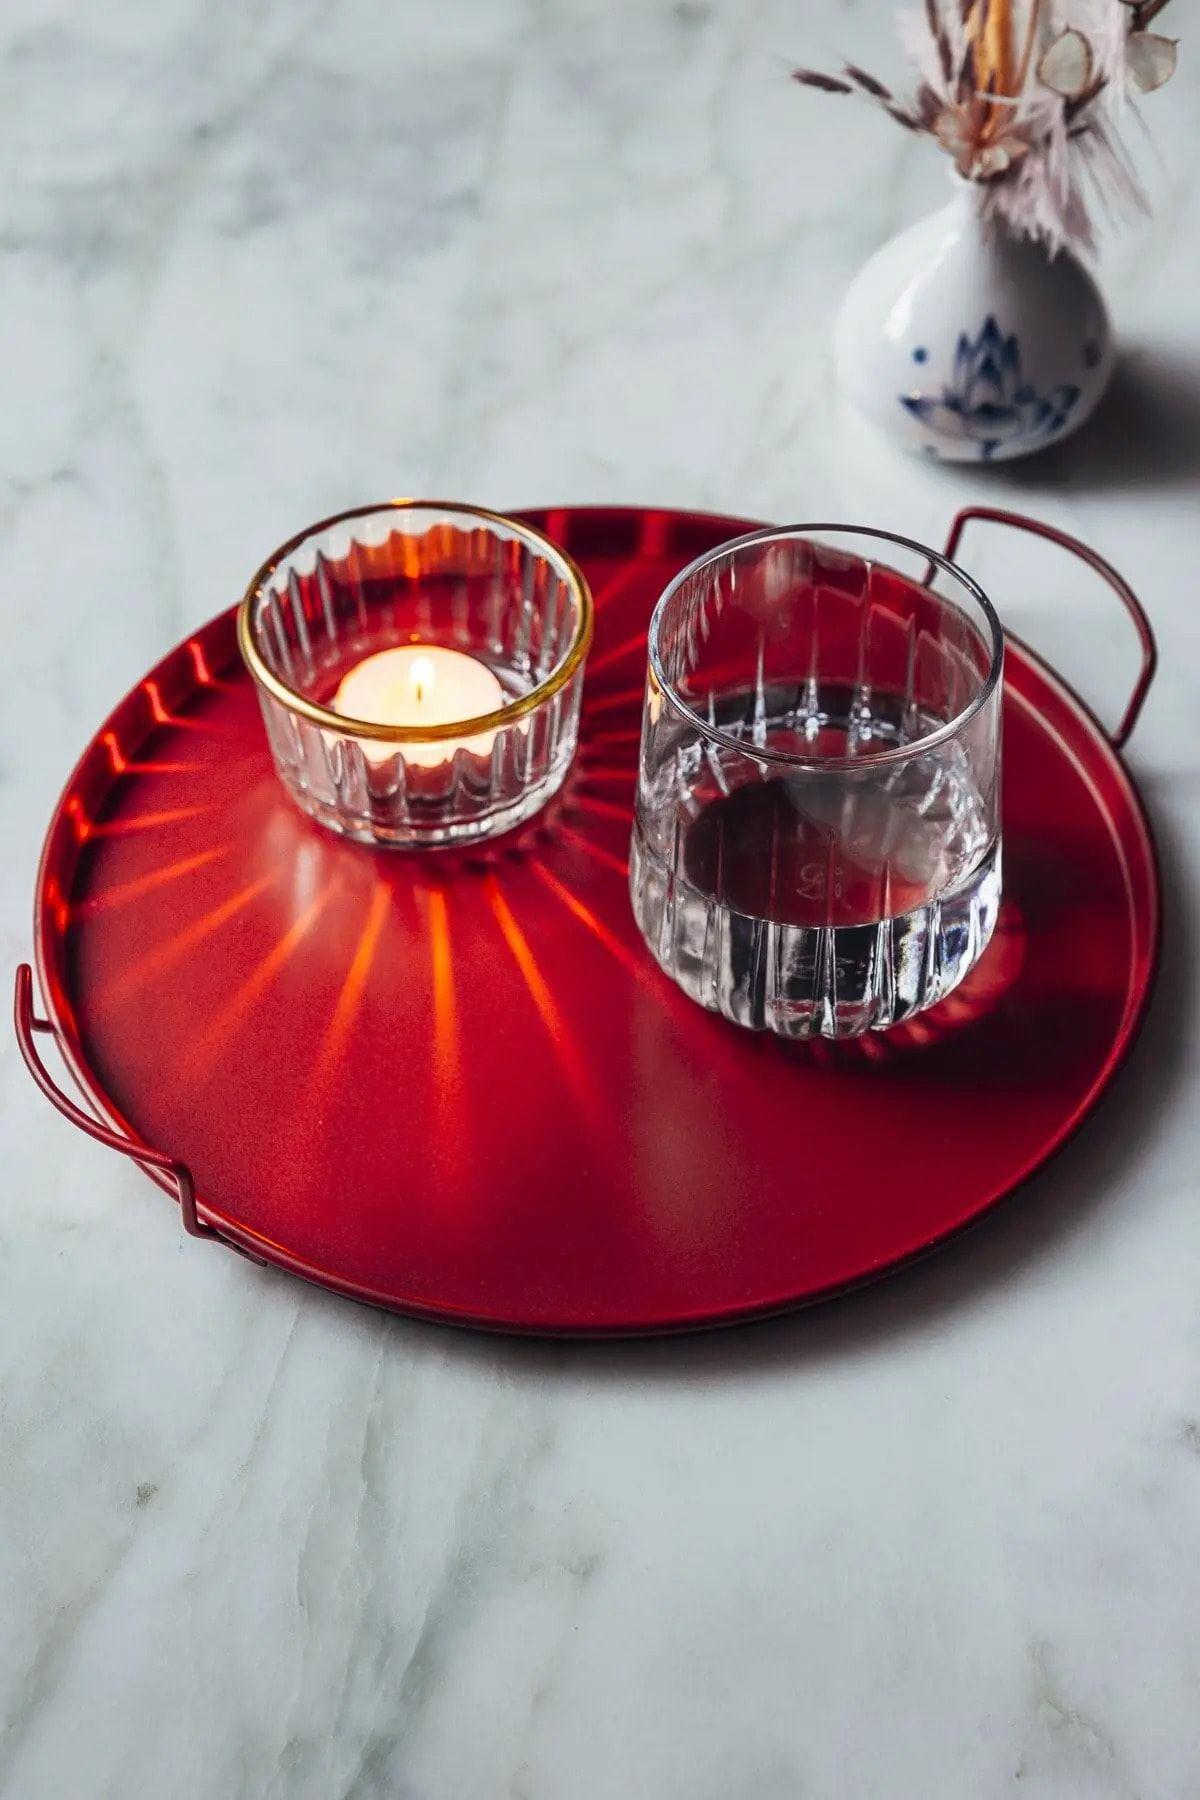 Metal Kırmızı Küçük Sunum Dekoratif Tepsi